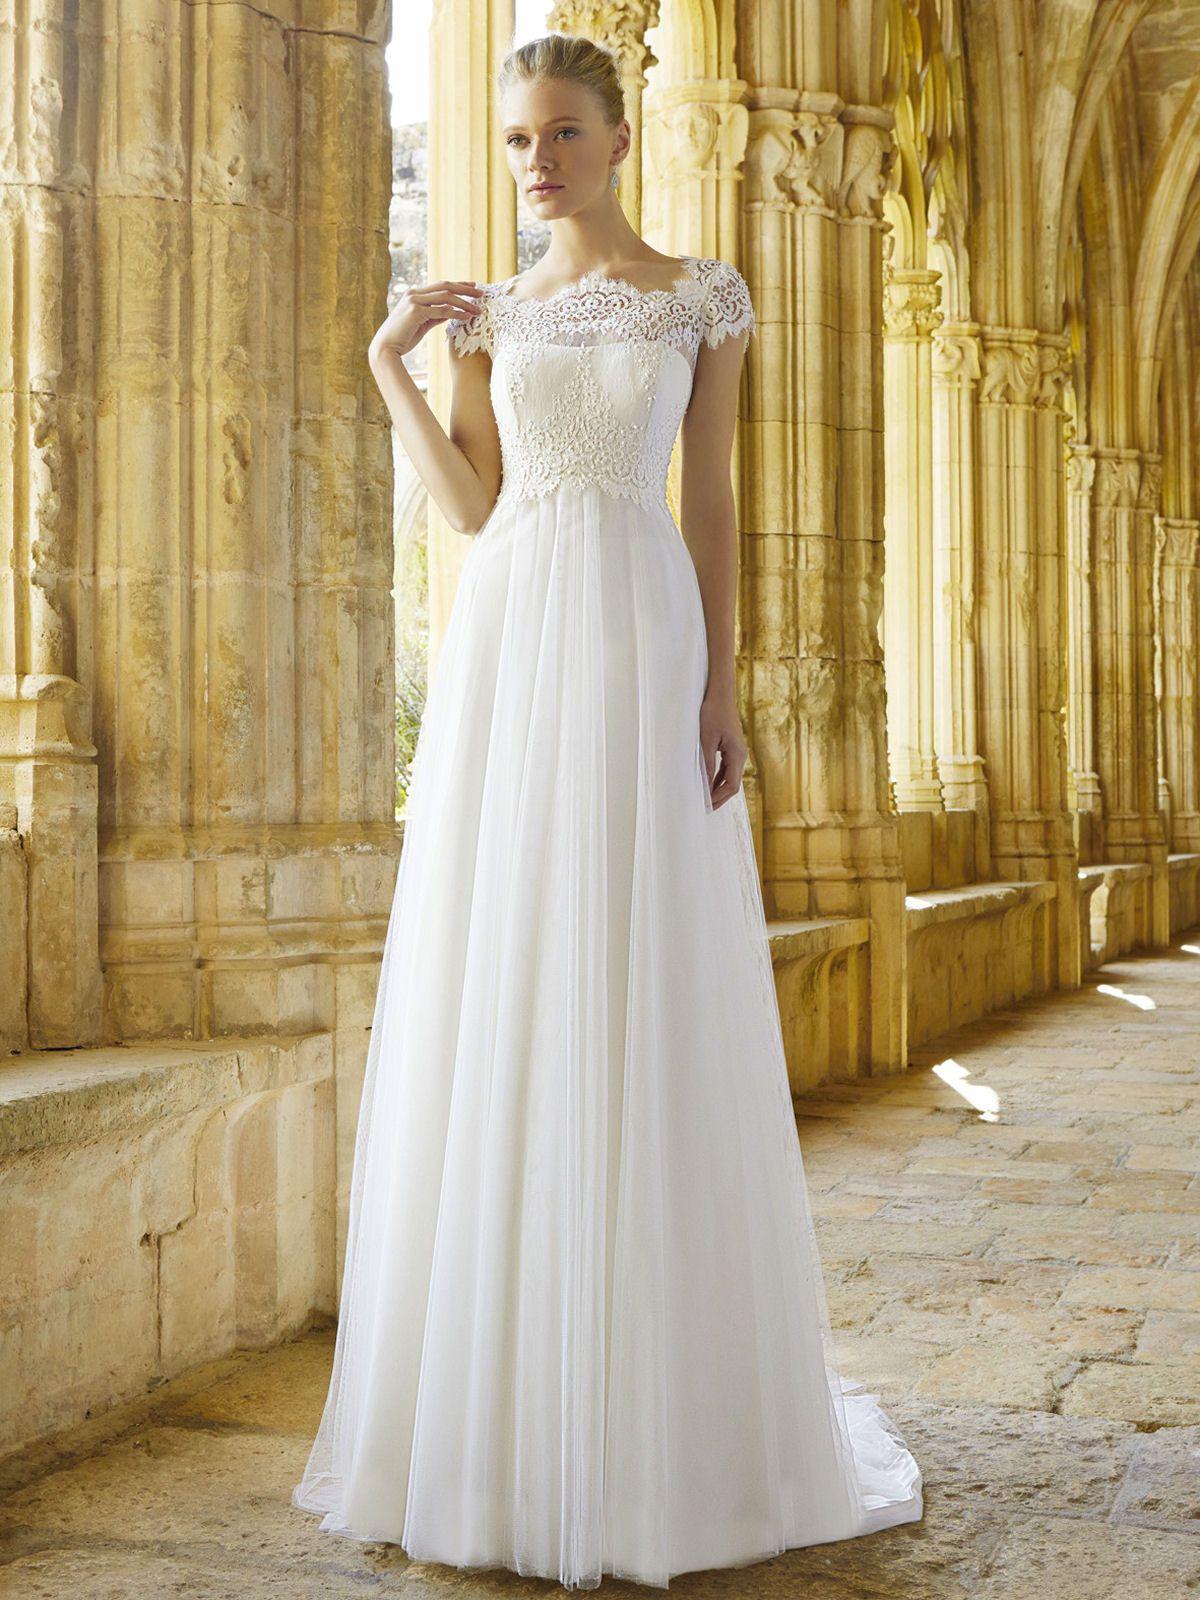 Mimi from Raimon Bundo | Wedding Dress Ideas | Pinterest | Wedding ...